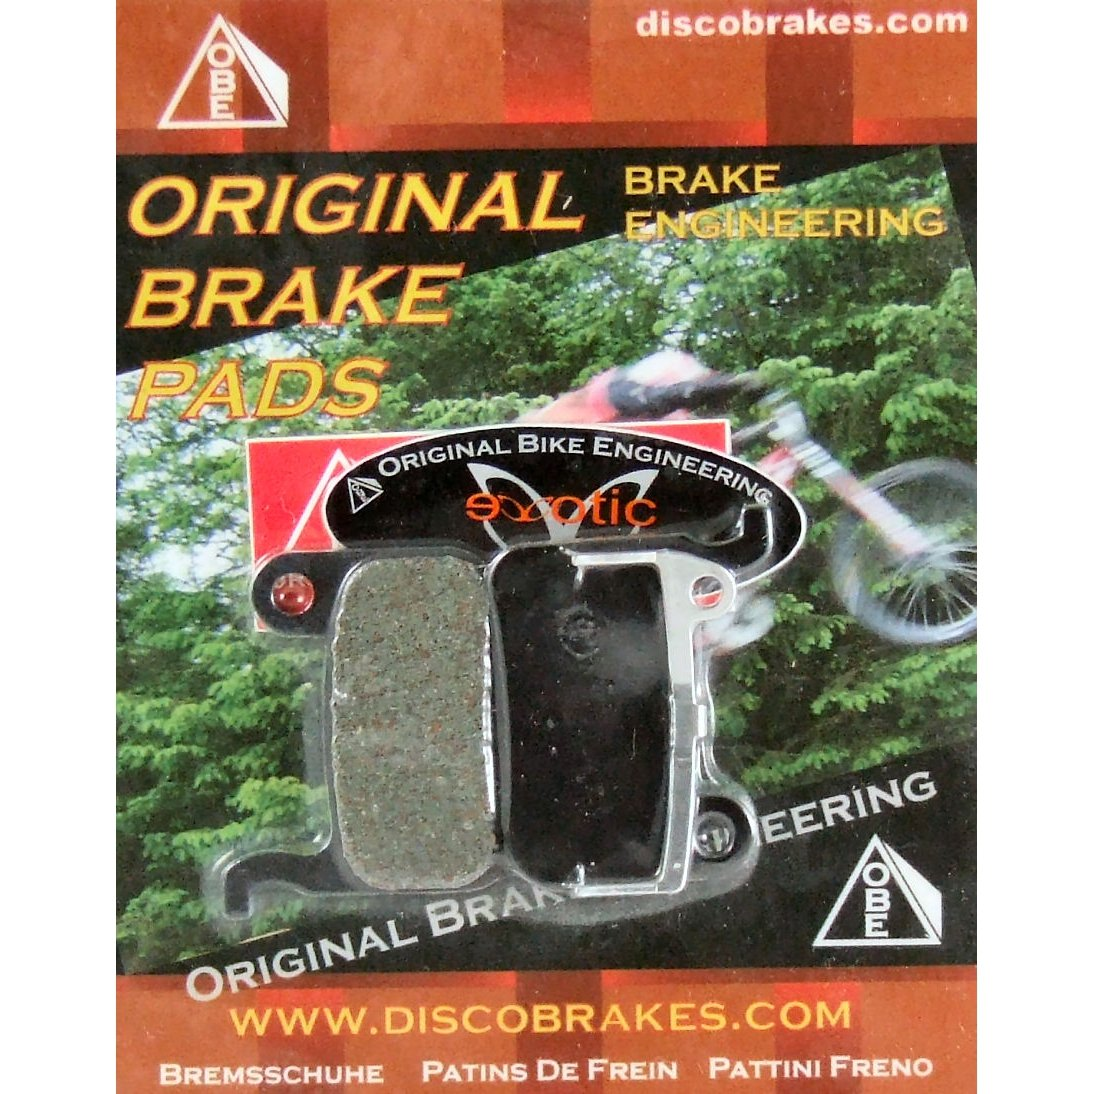 Shimano XTR XT Saint Hone Disc Brake Pads DiscoB BR-M975 M966 965 800 775 SLX LX